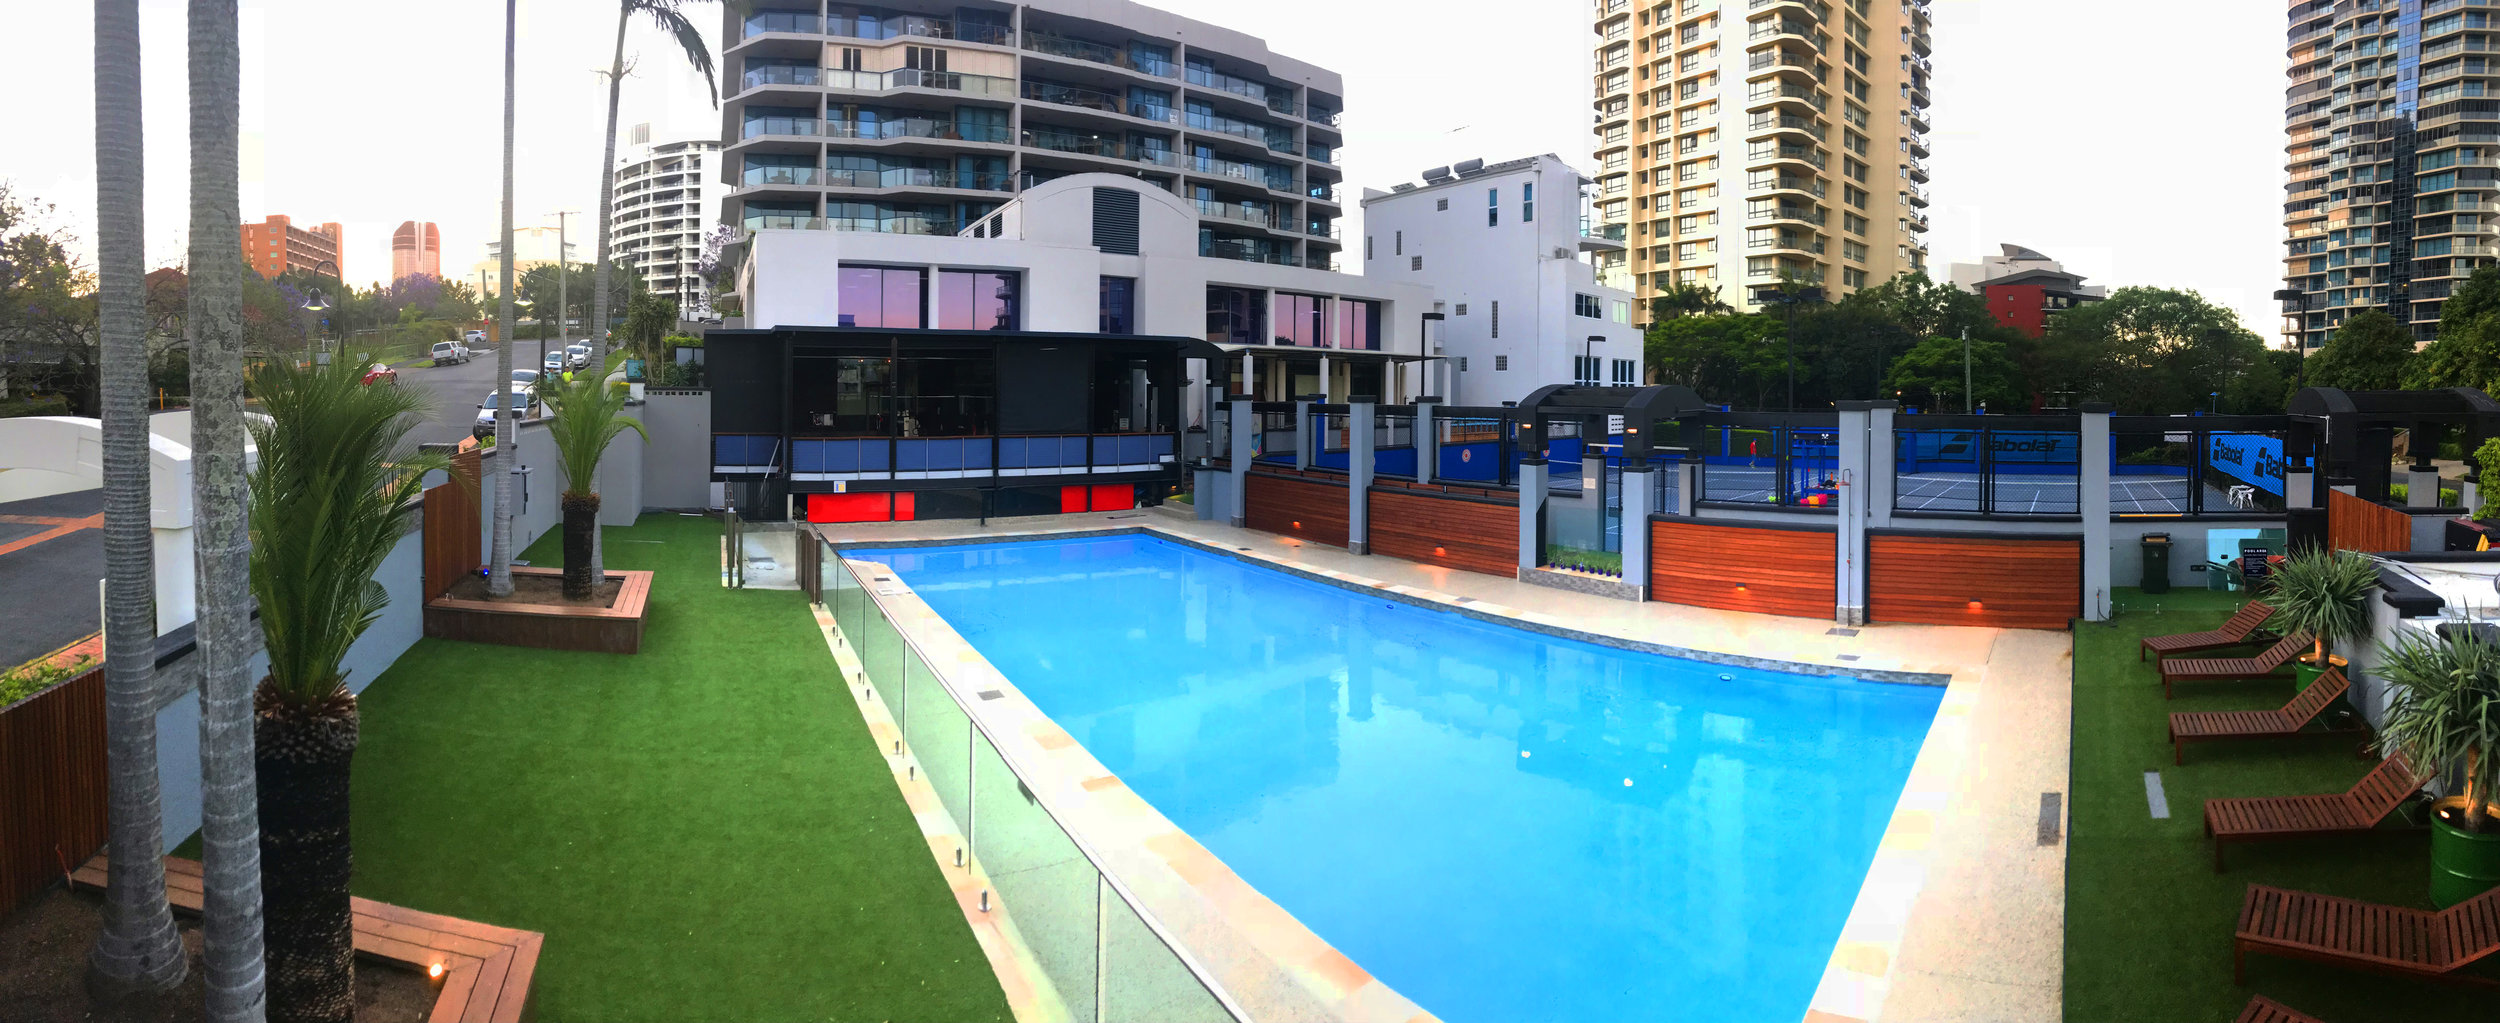 Pool and Lounge